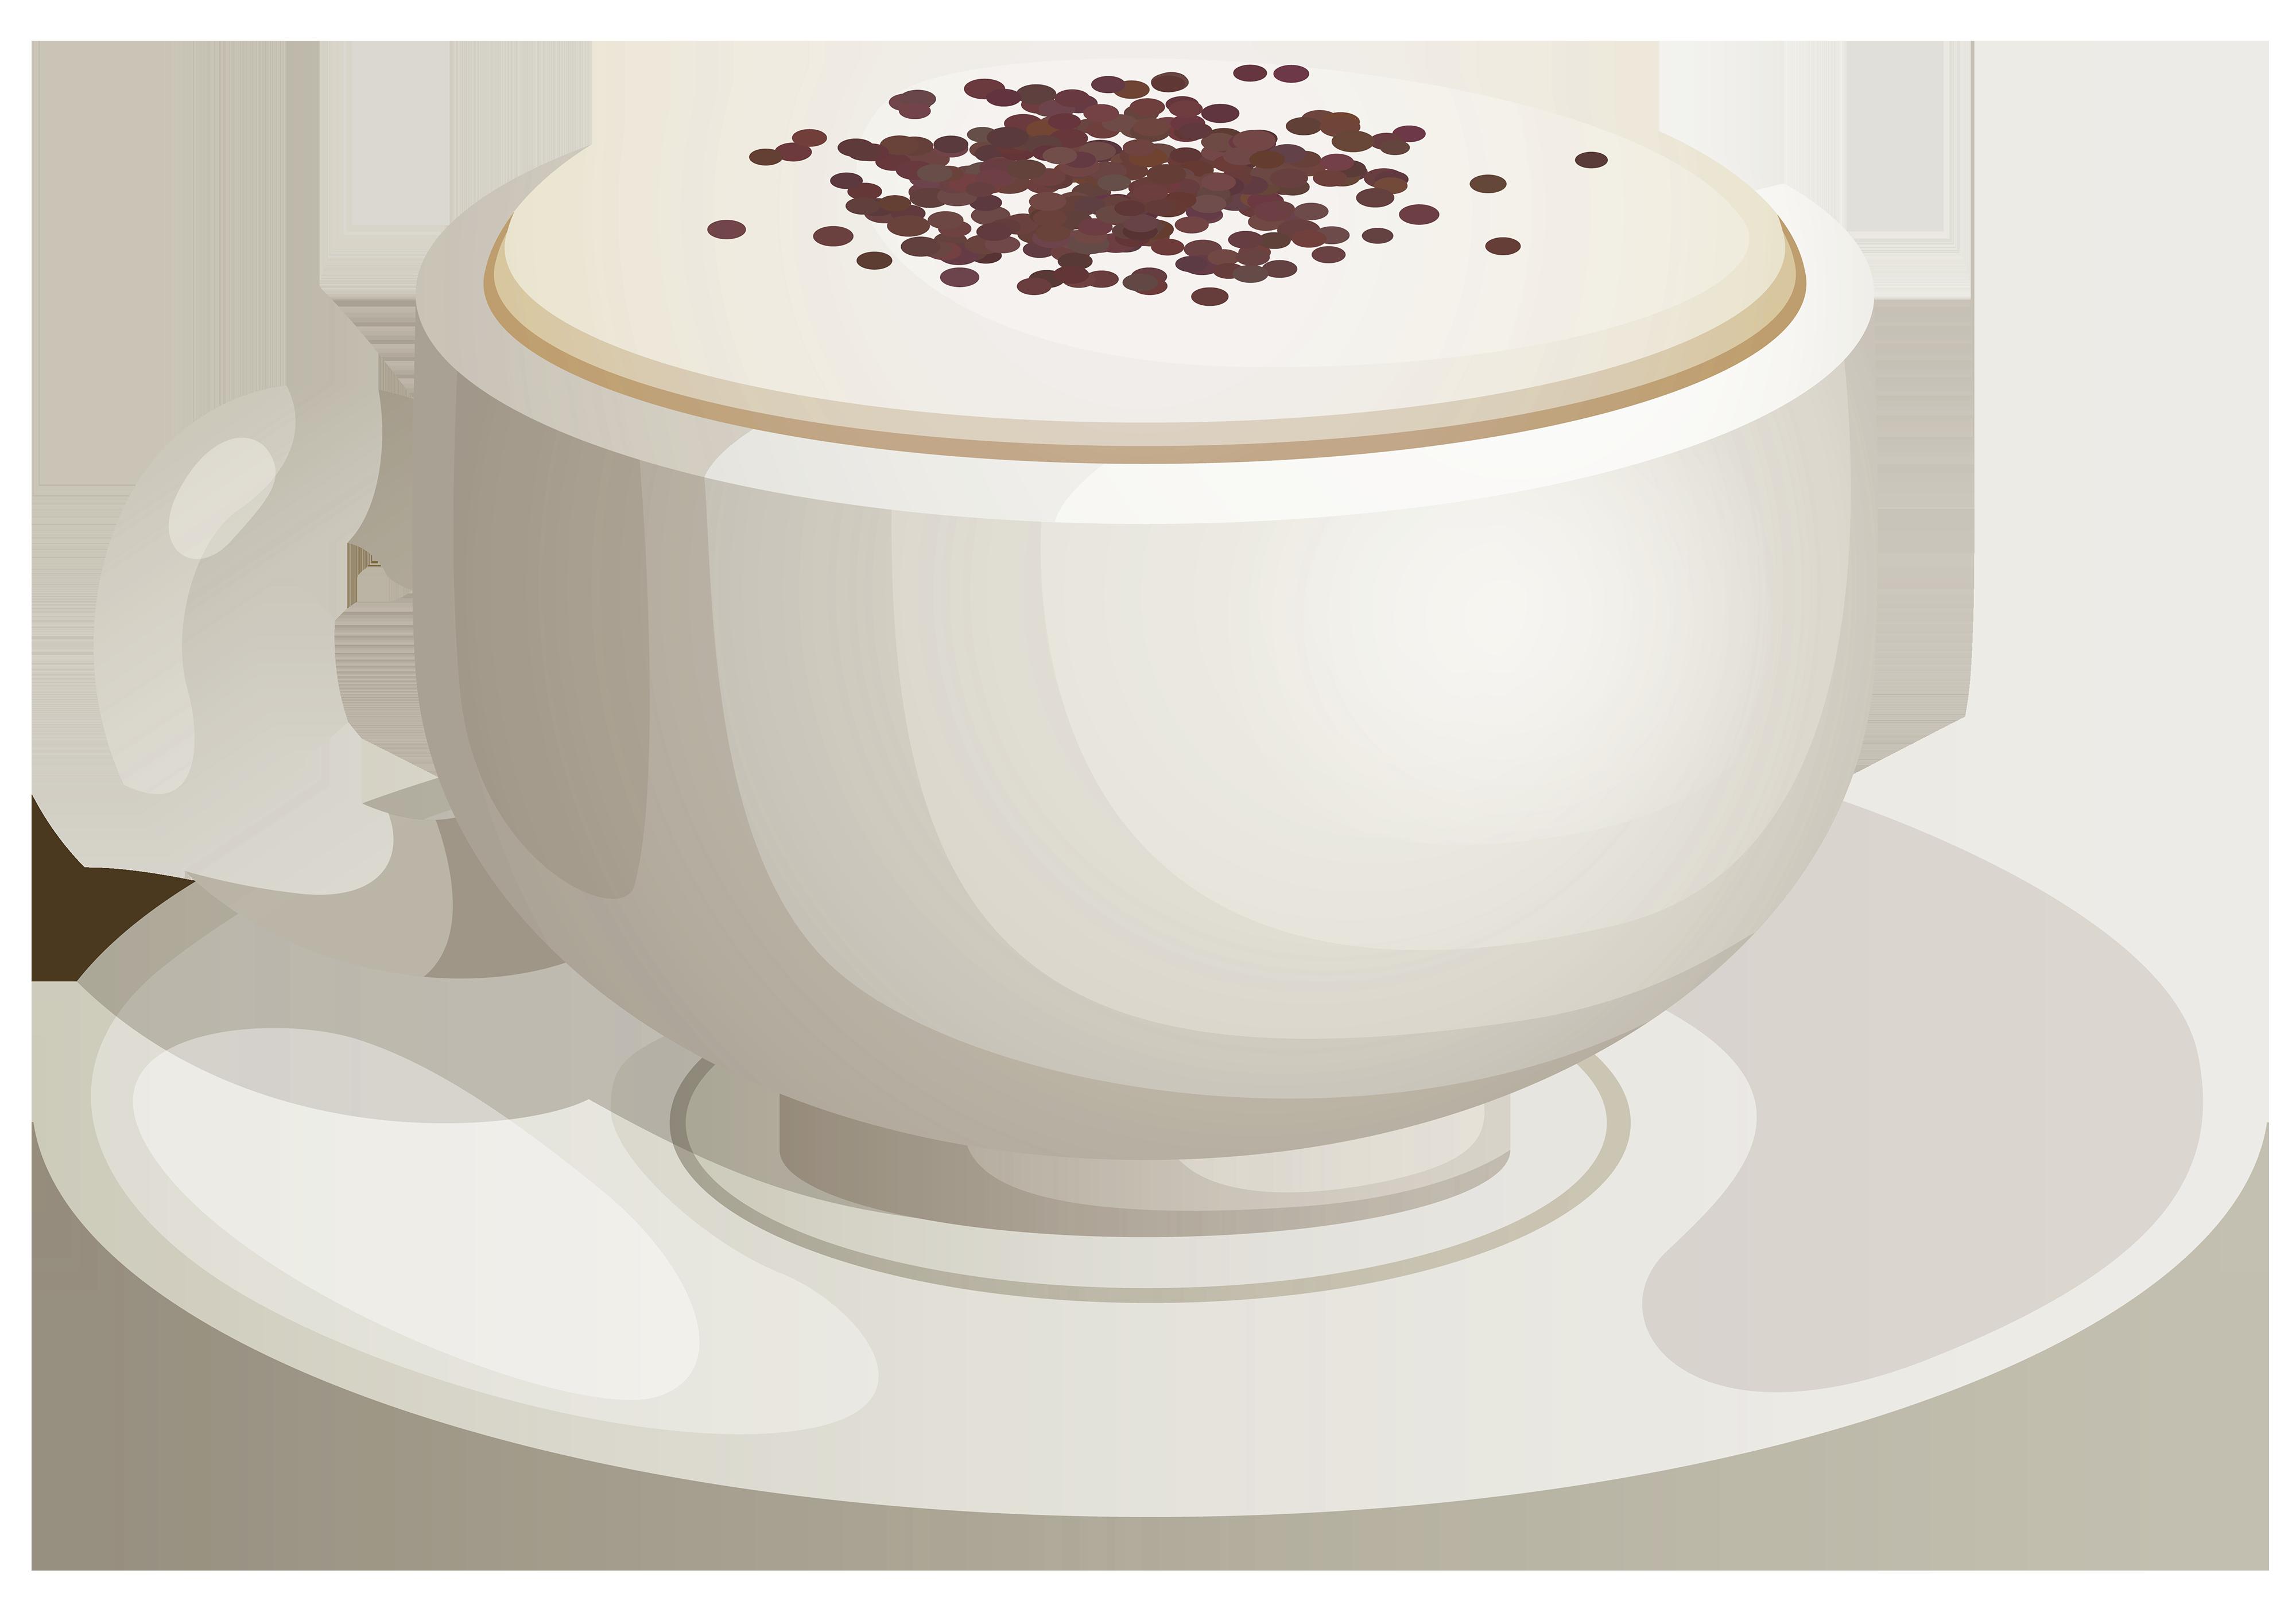 Pumpkin cappuccino clipart clip art royalty free library Coffee clipart cappuccino - Graphics - Illustrations - Free Download ... clip art royalty free library